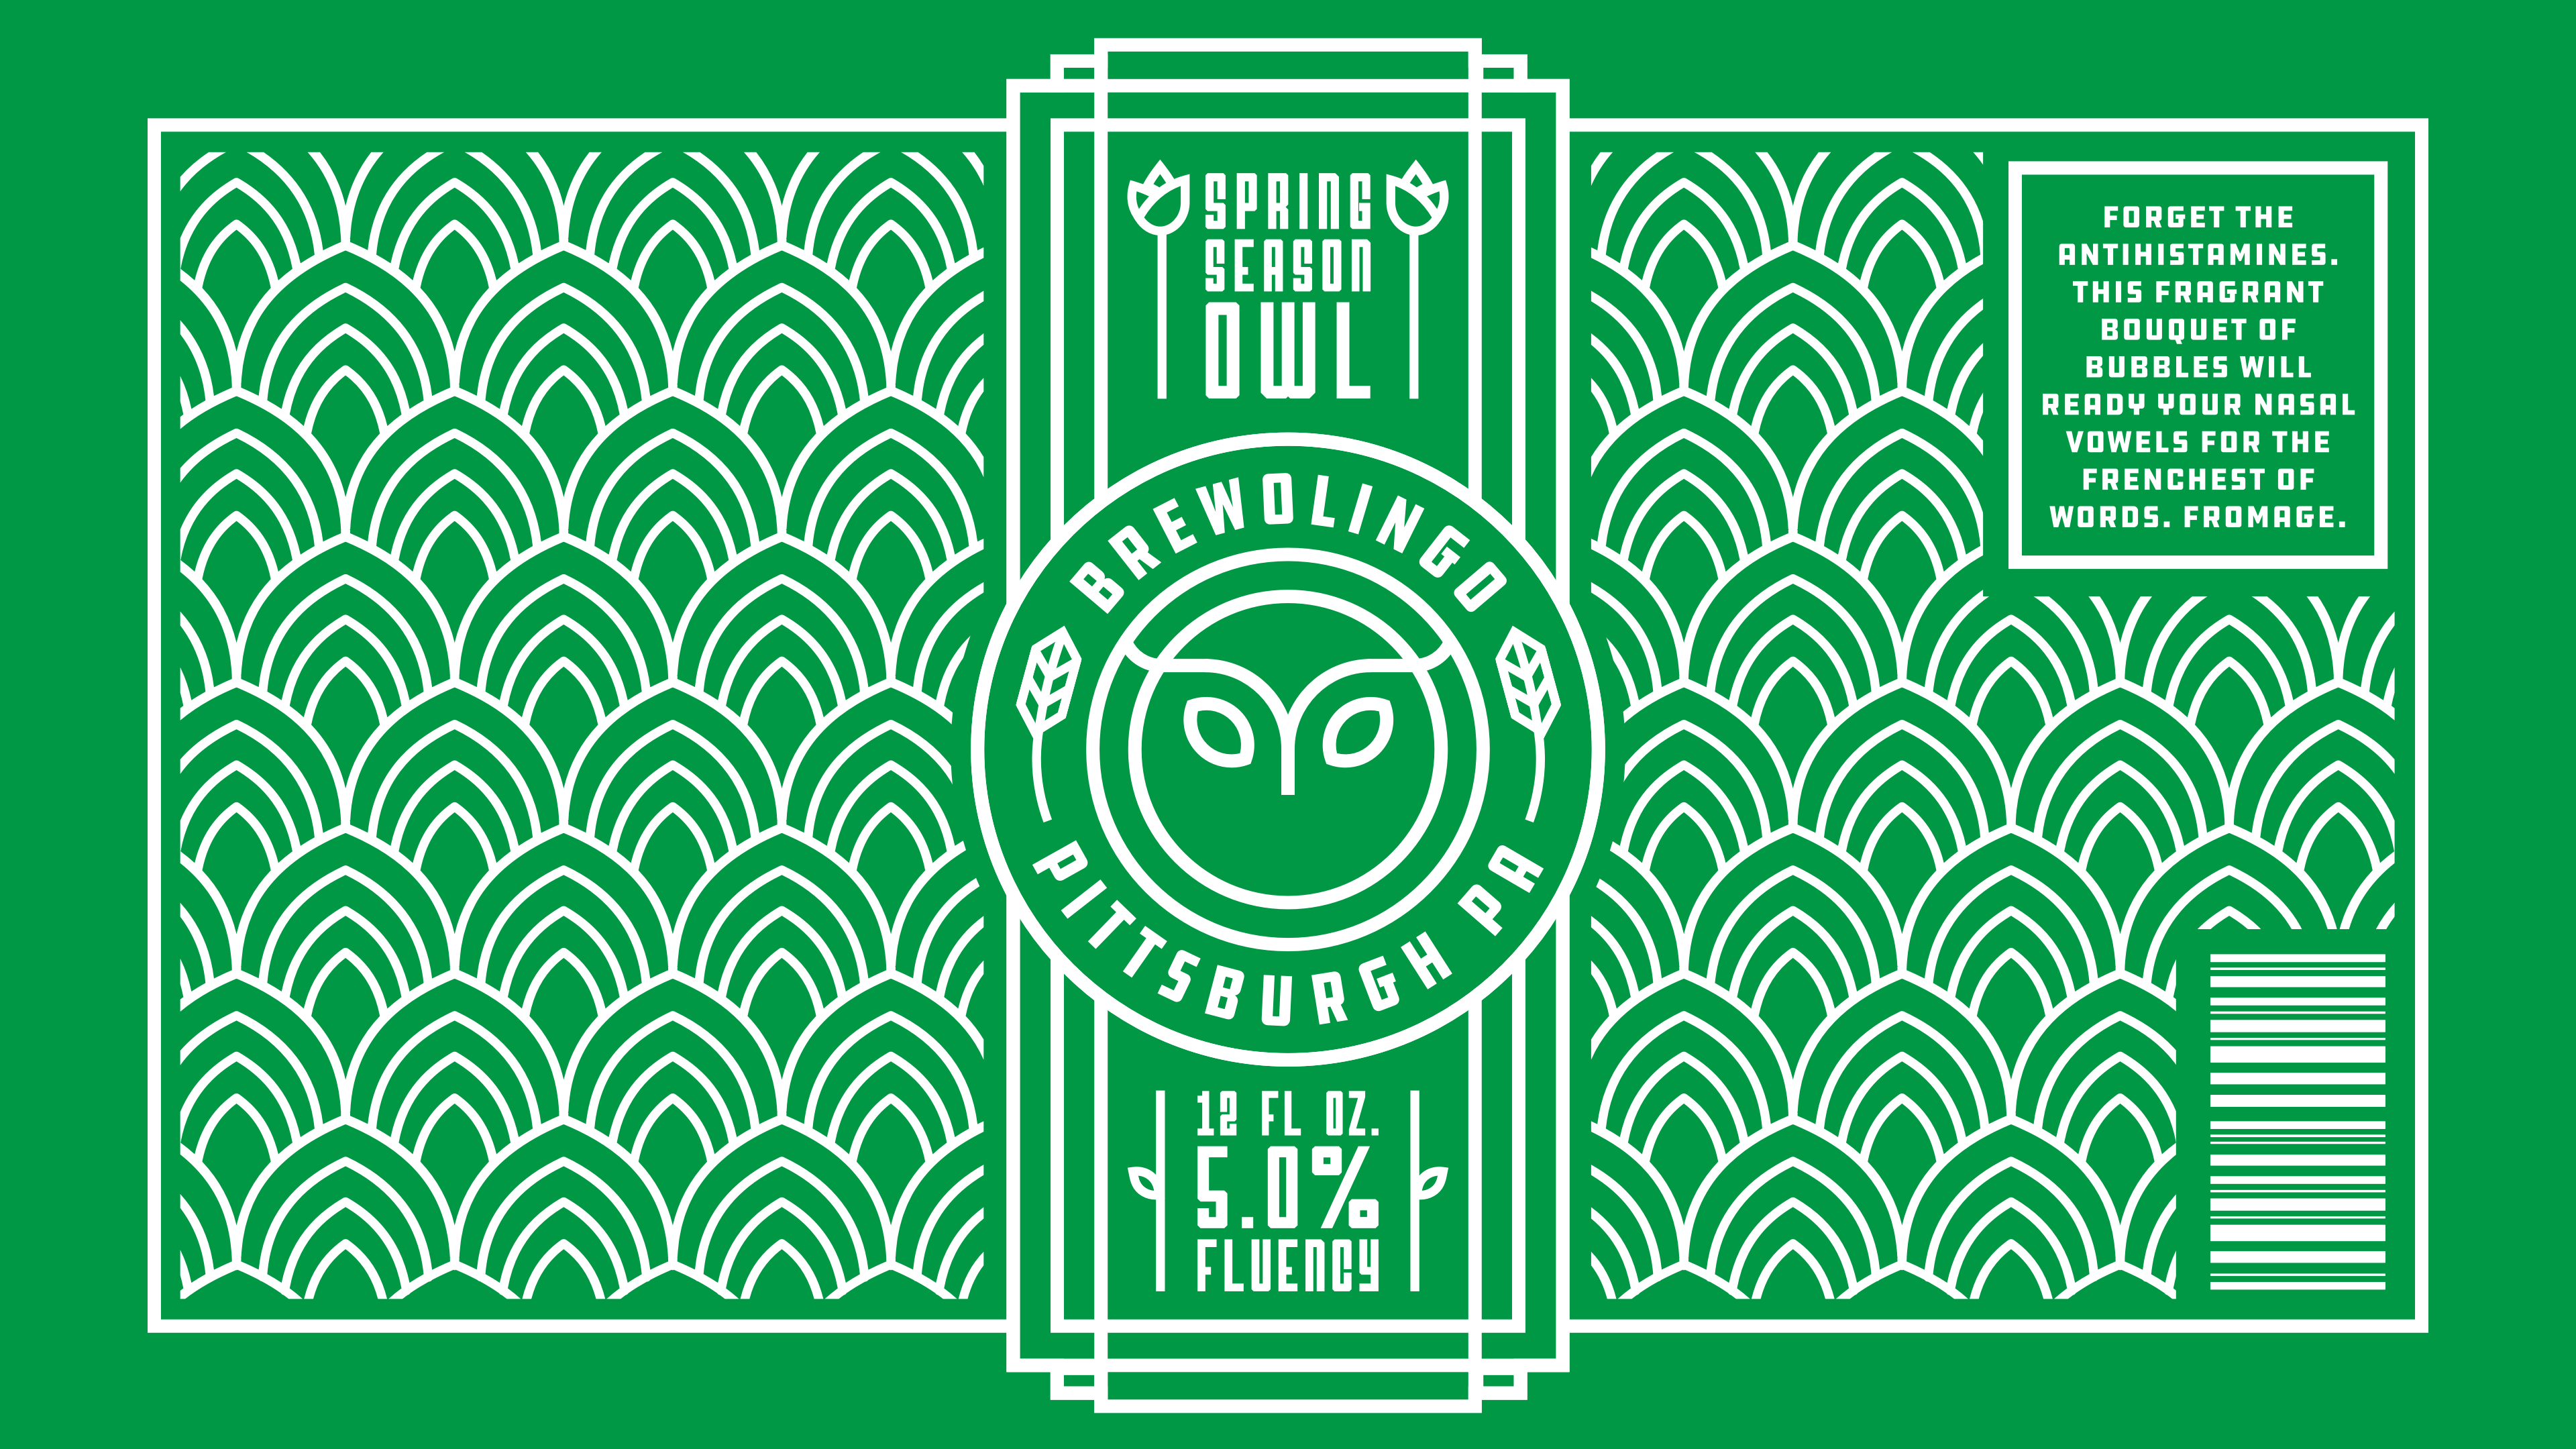 Brewolingo Spring Season Owl Branding by Jack Morgan